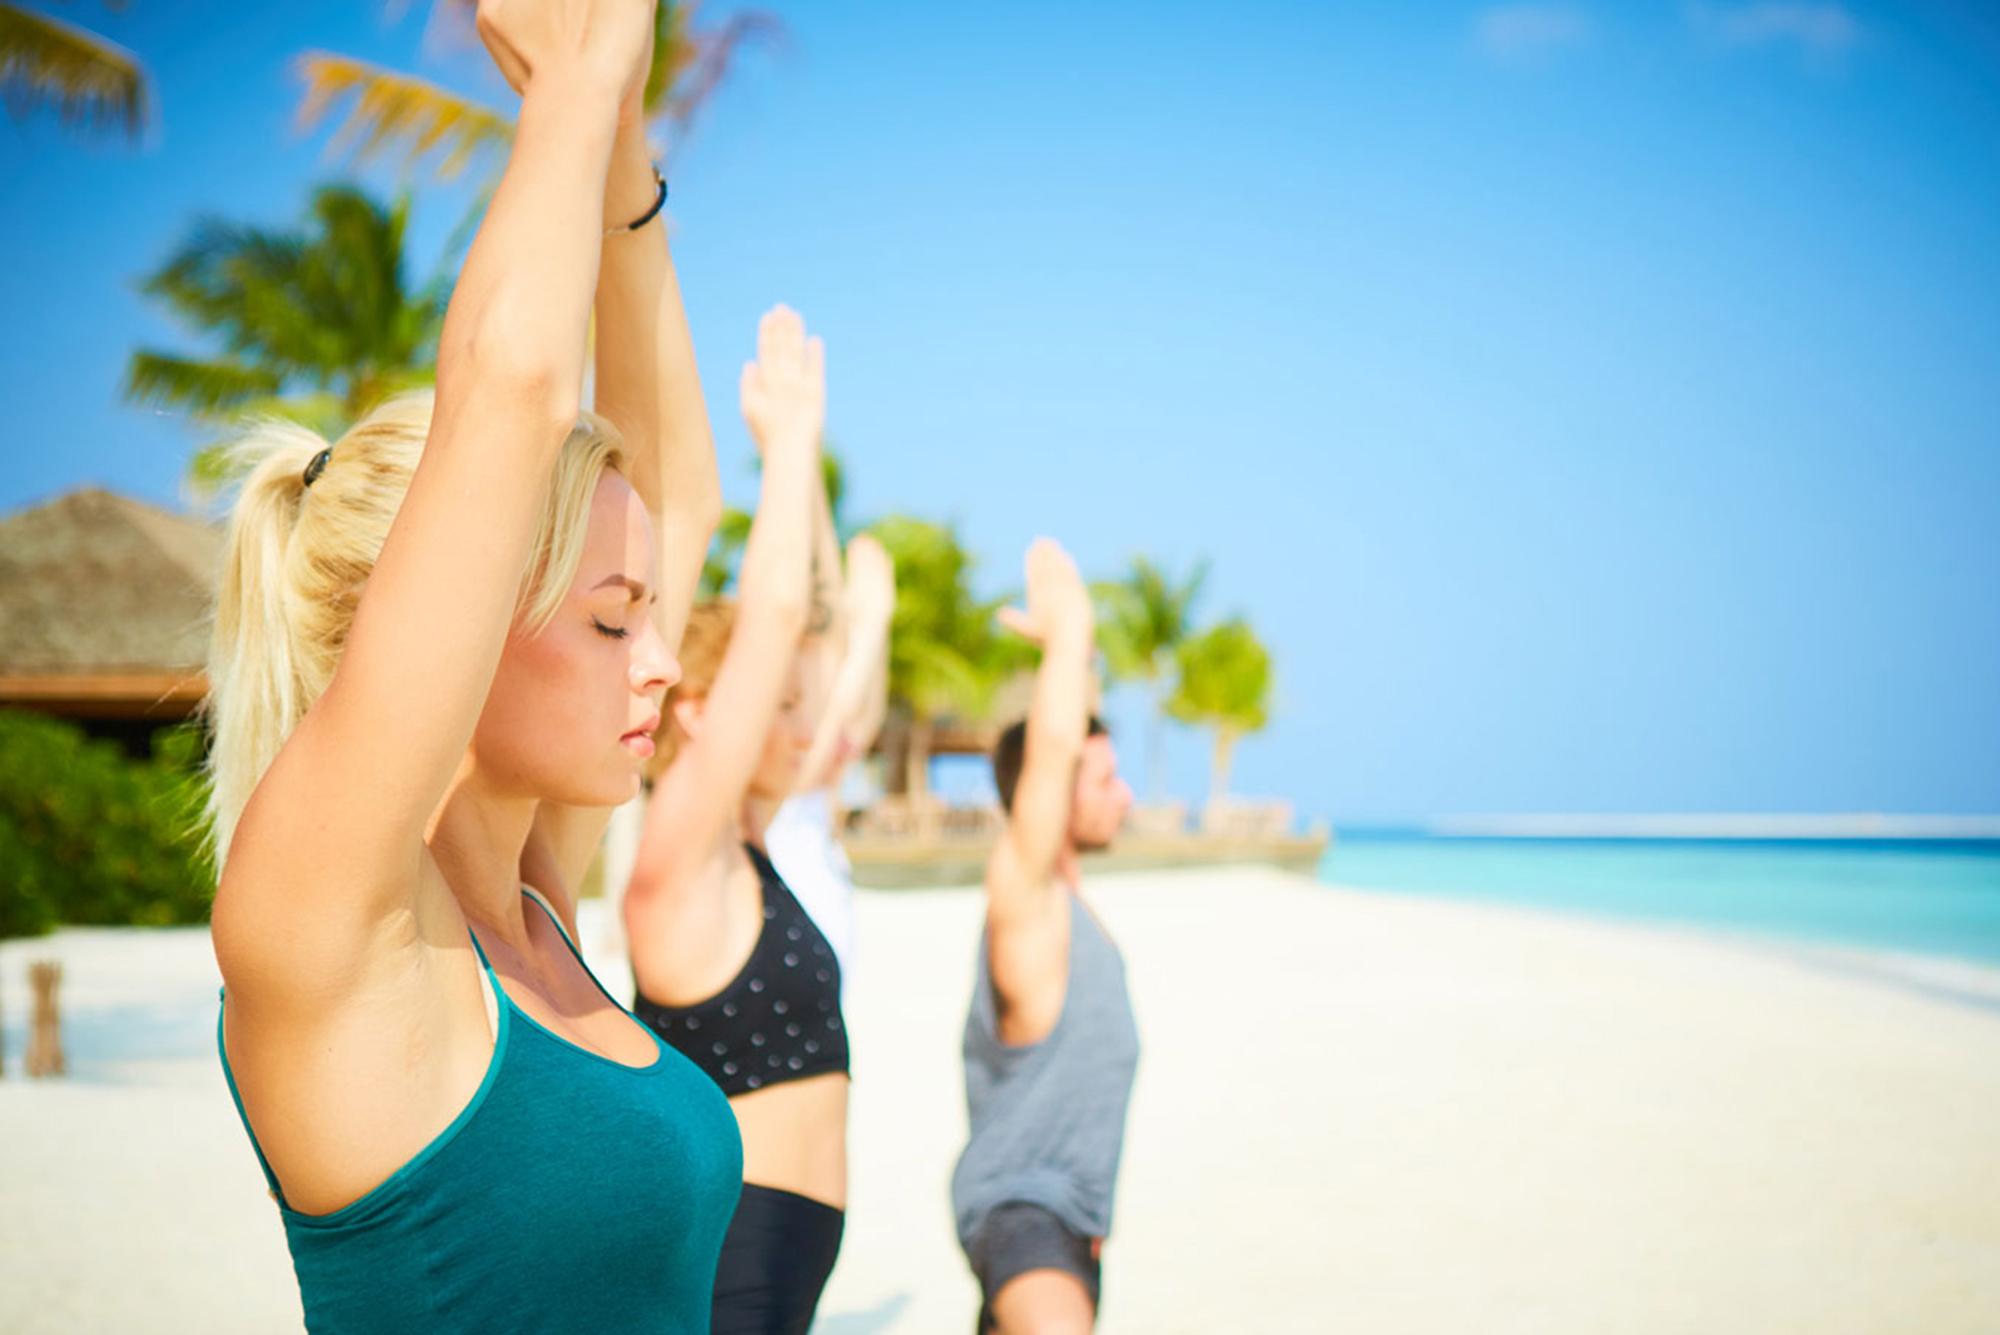 Йога на солнечном побережье